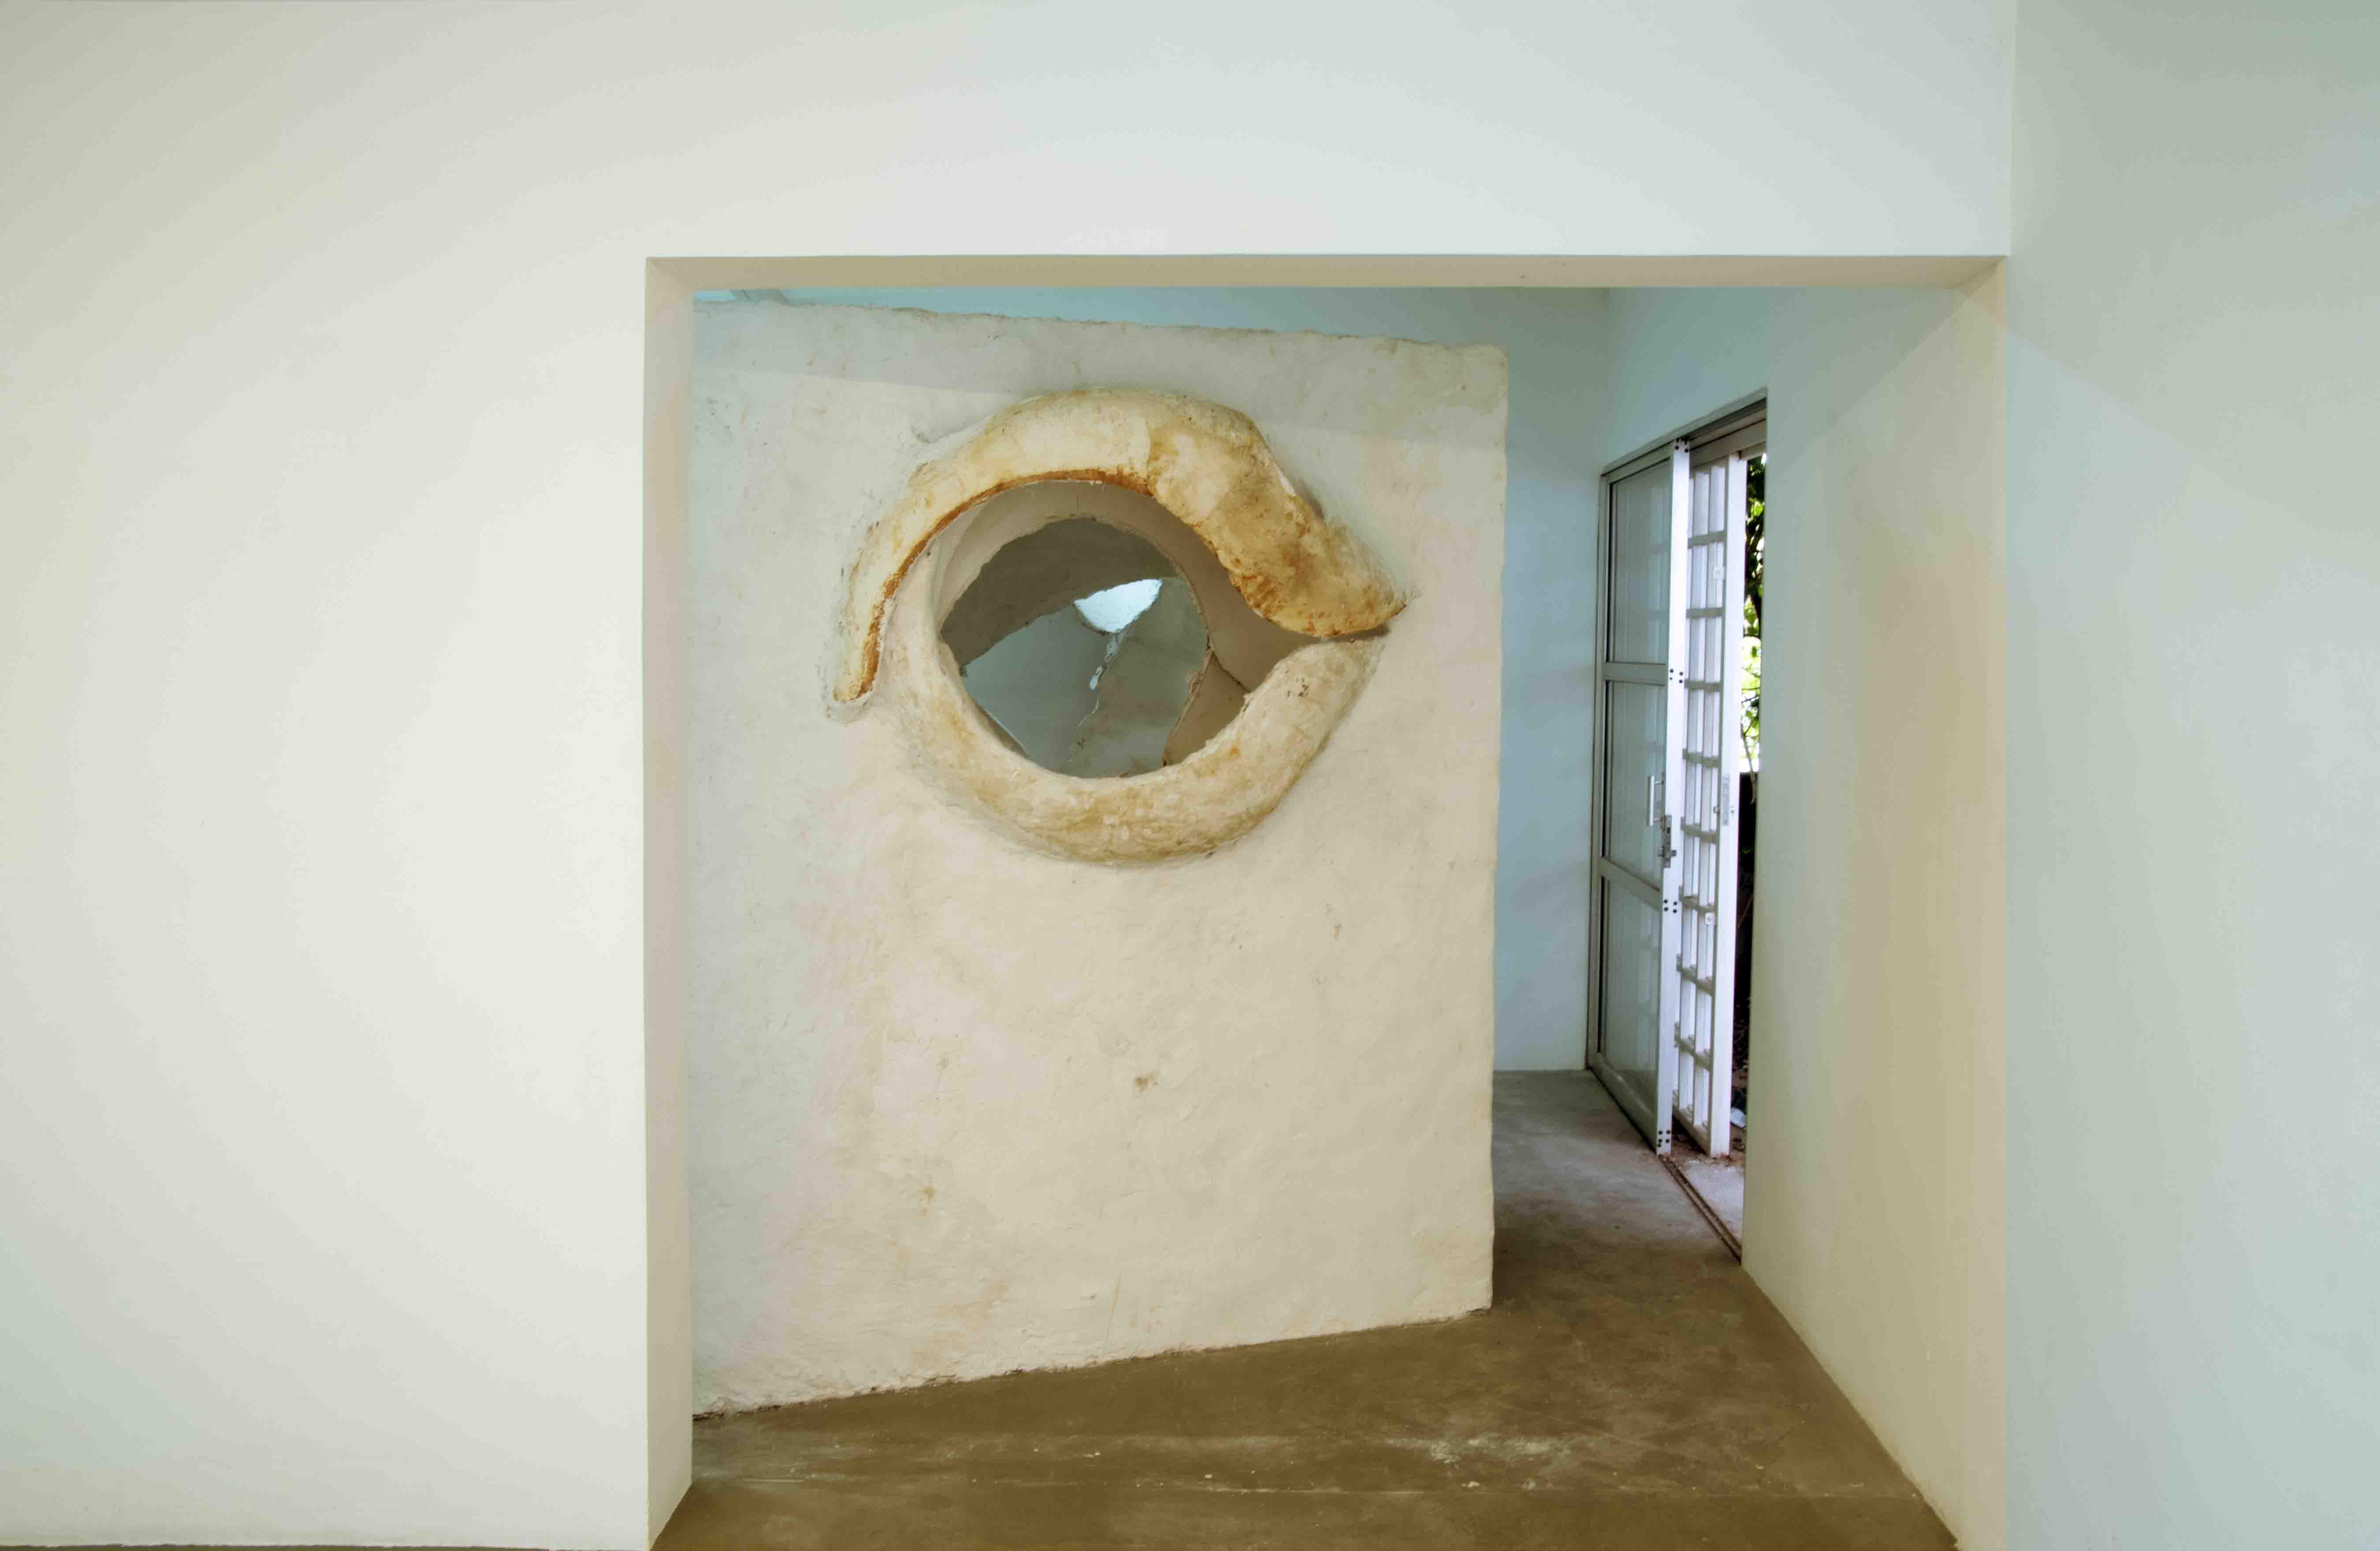 06. GaKO. art. André Kruysen. Inner Gaze , Madeira, aço e gesso. Wood, steel, plaster. 220 x 186 x 152 cm 2019-BX